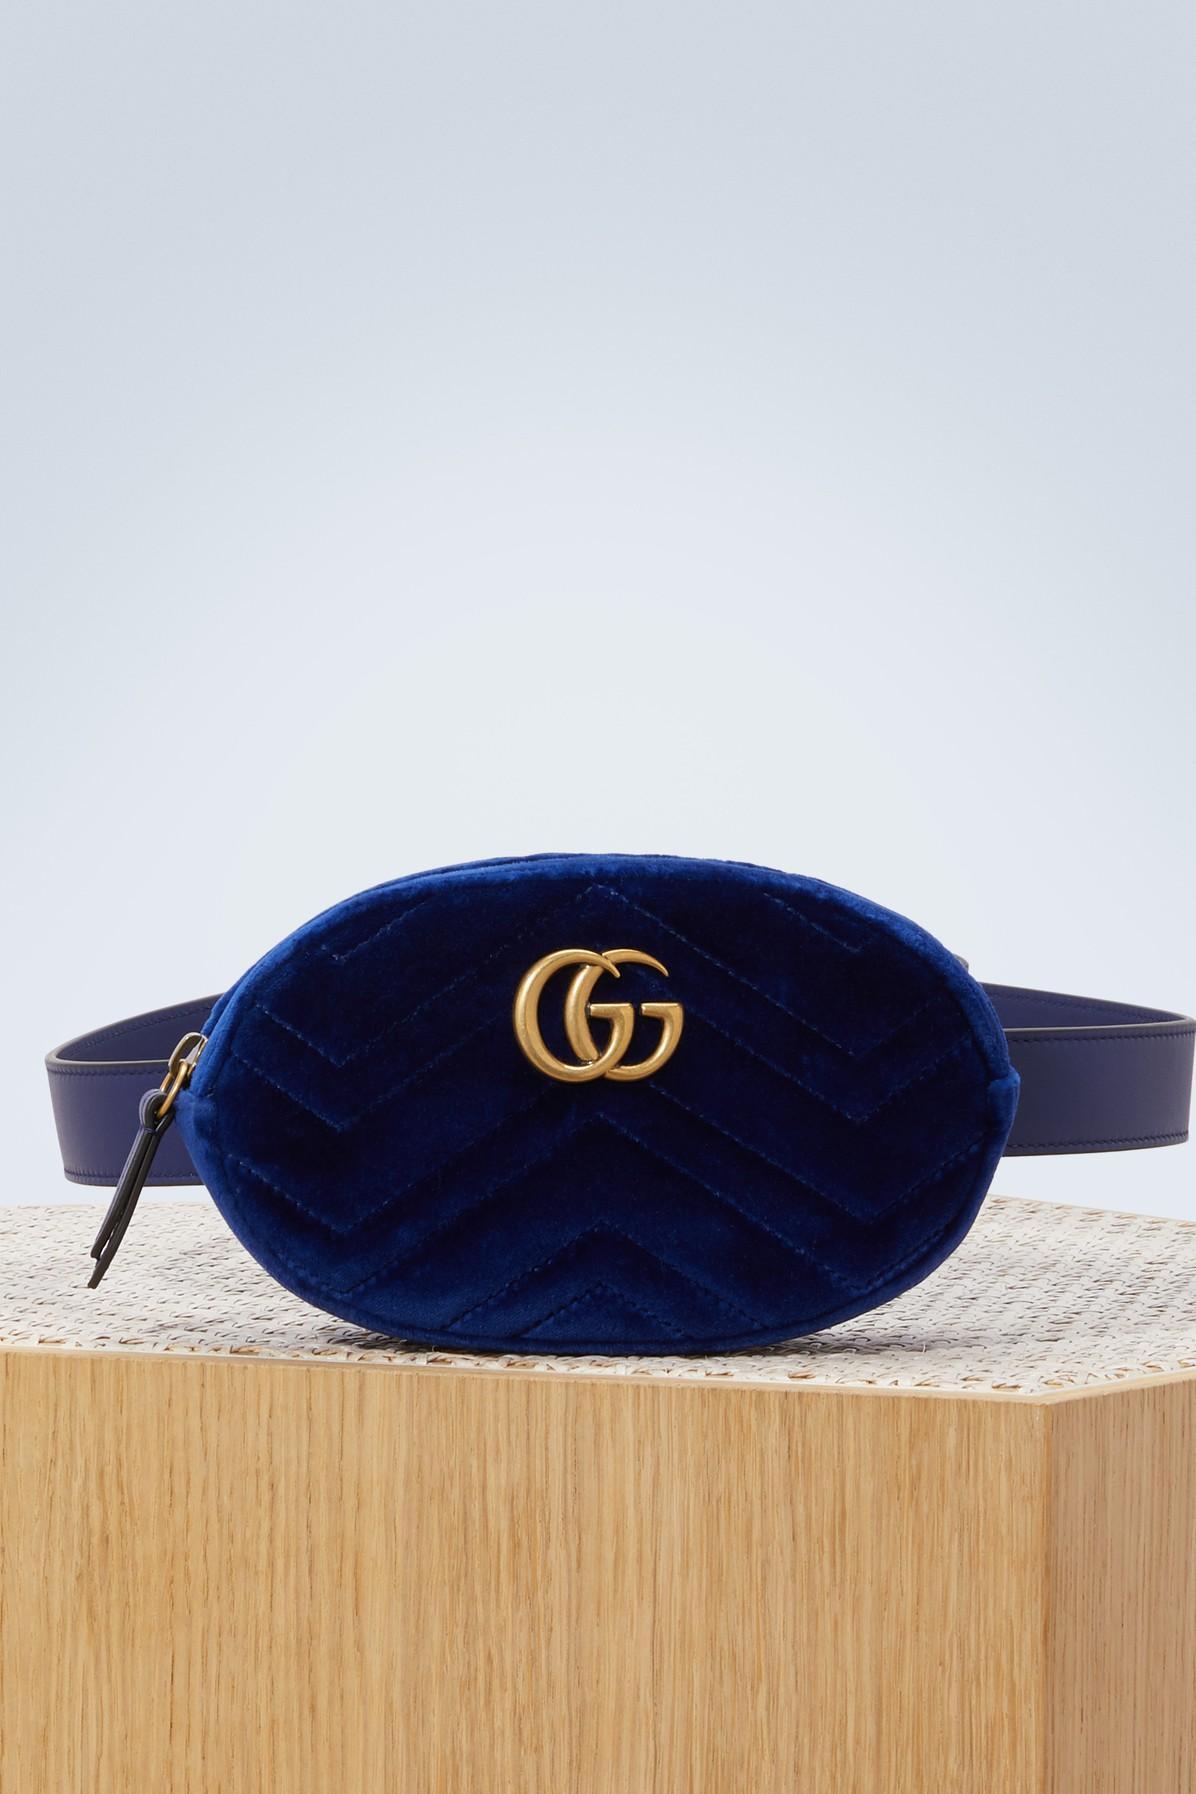 88c095f8c5b Gucci Gg Marmont MatelassÉ Velvet Belt Bag In Cobalt